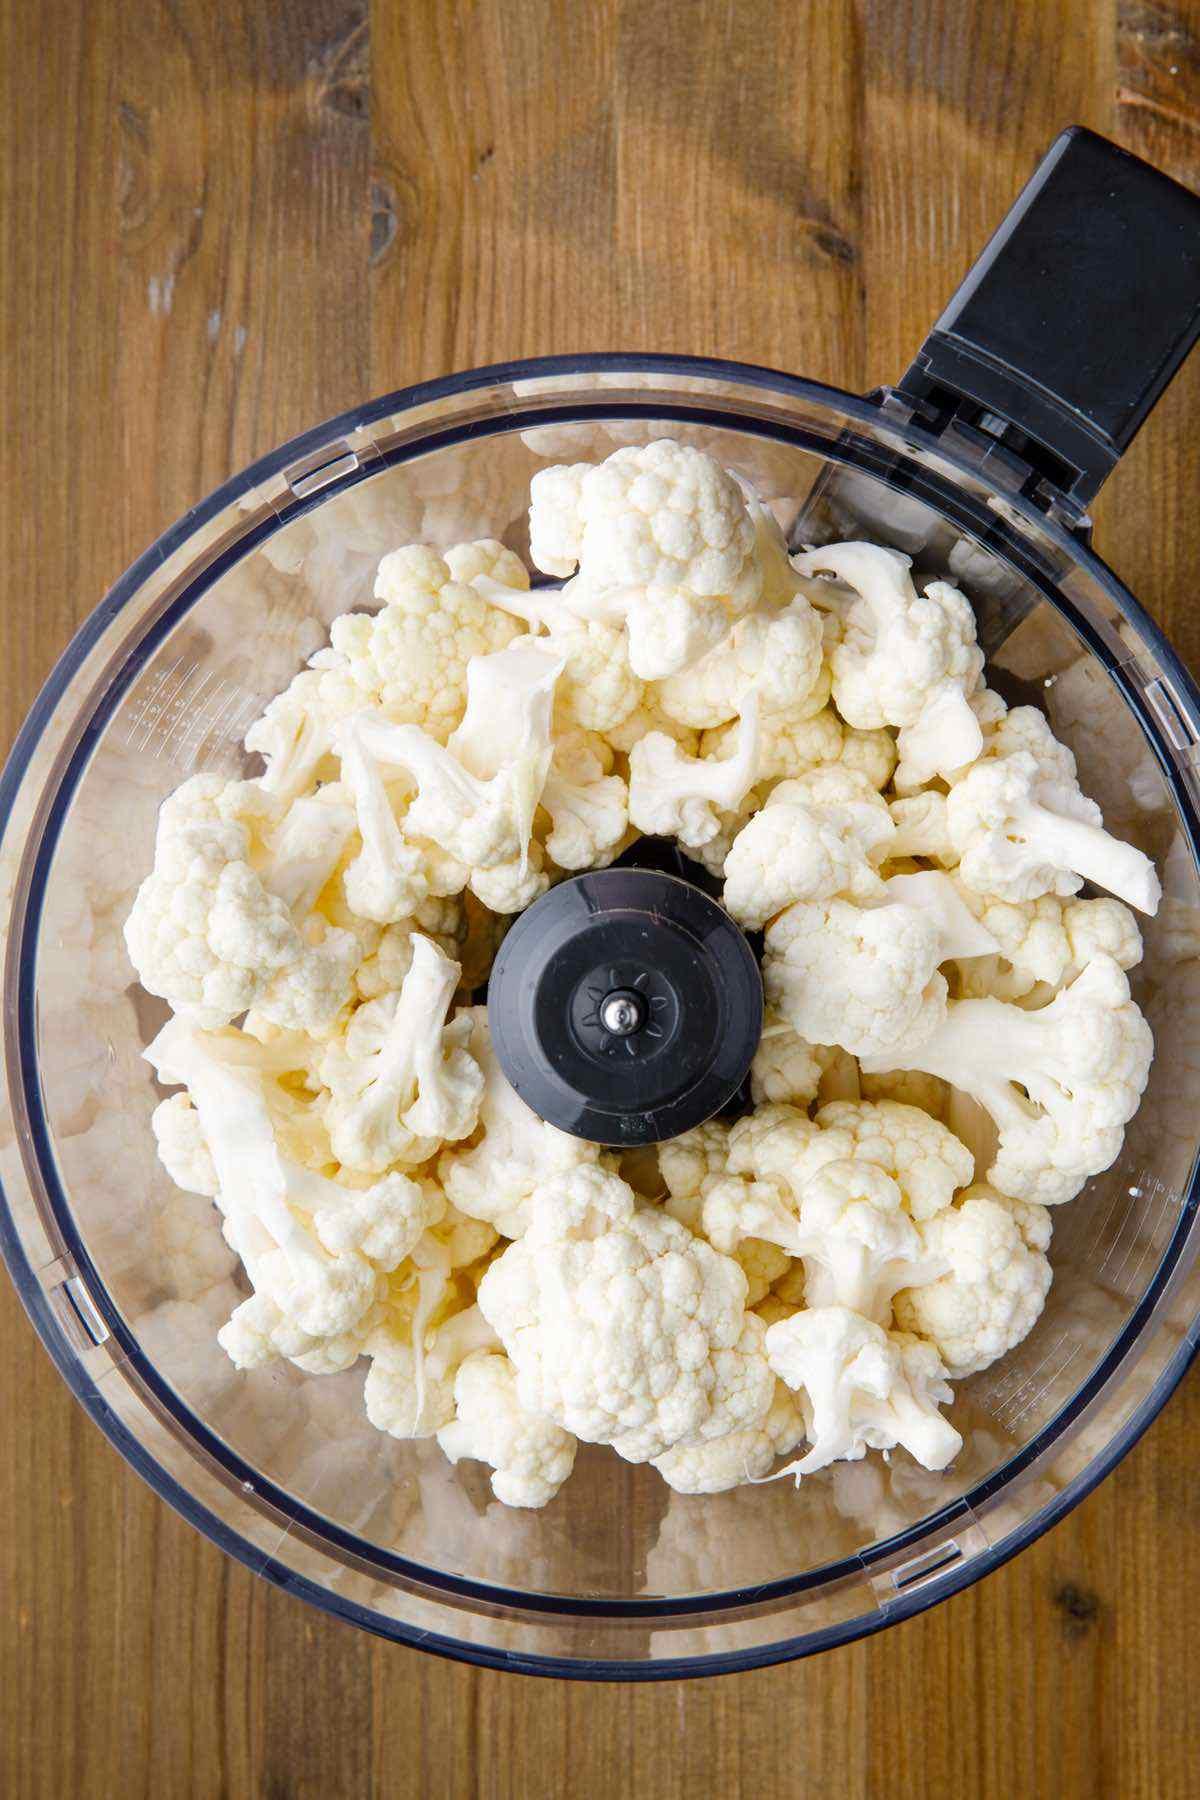 blending cauliflower